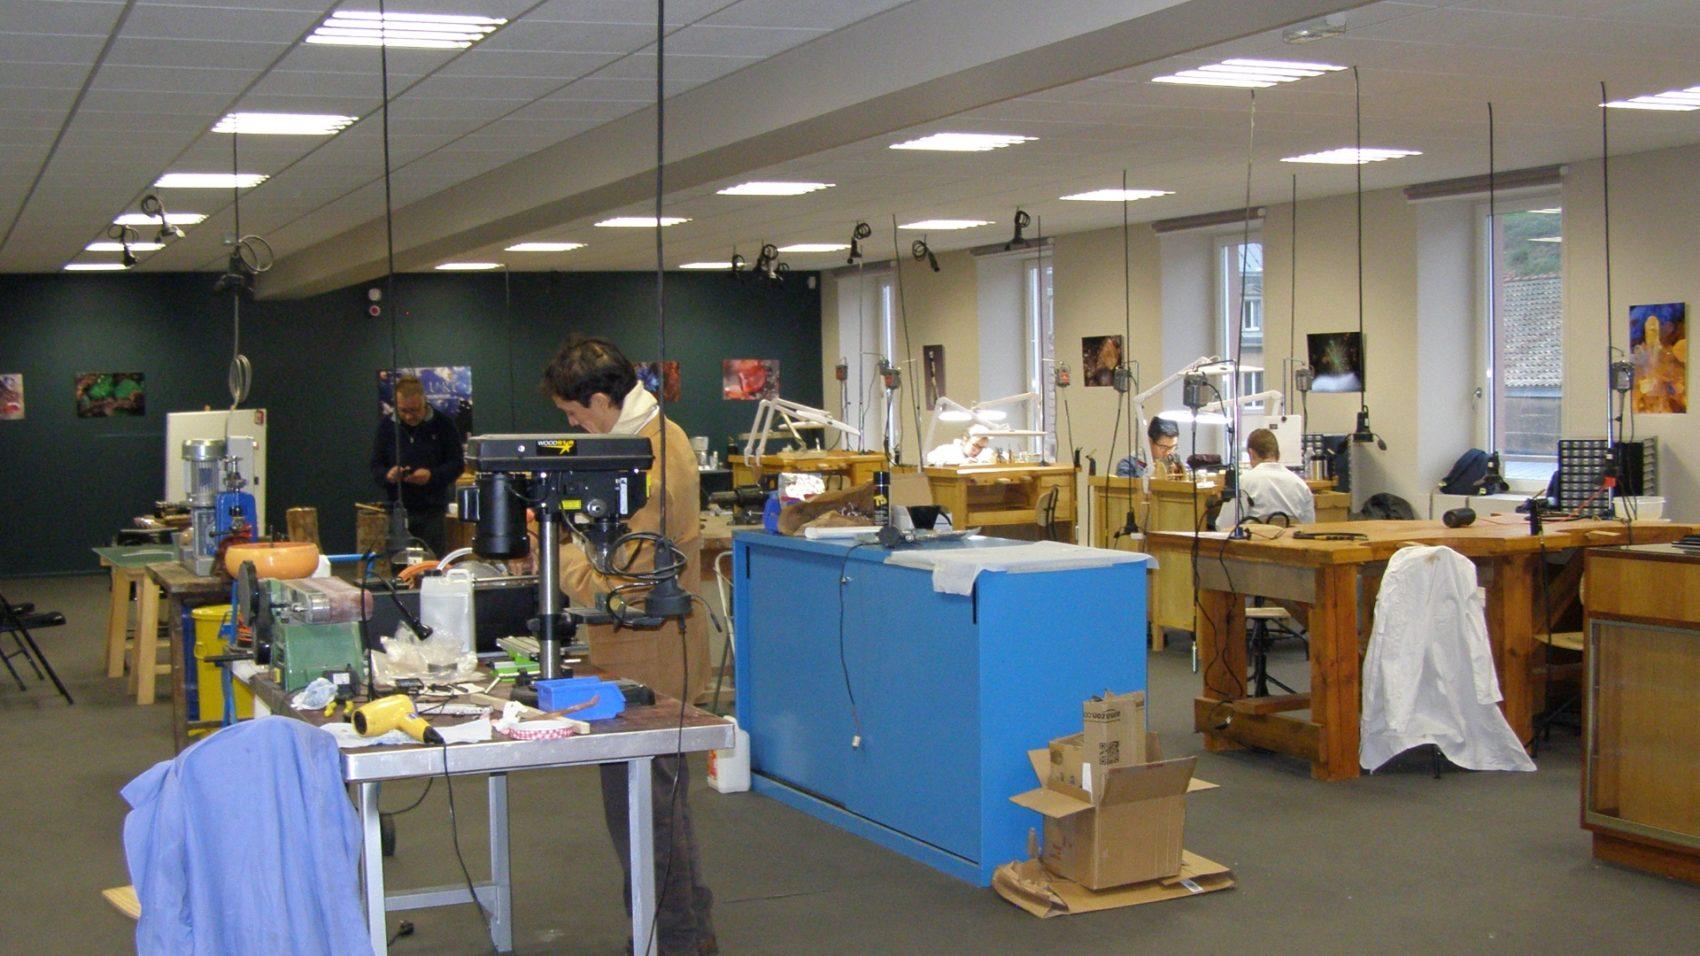 L'Atelier d'Emeraude